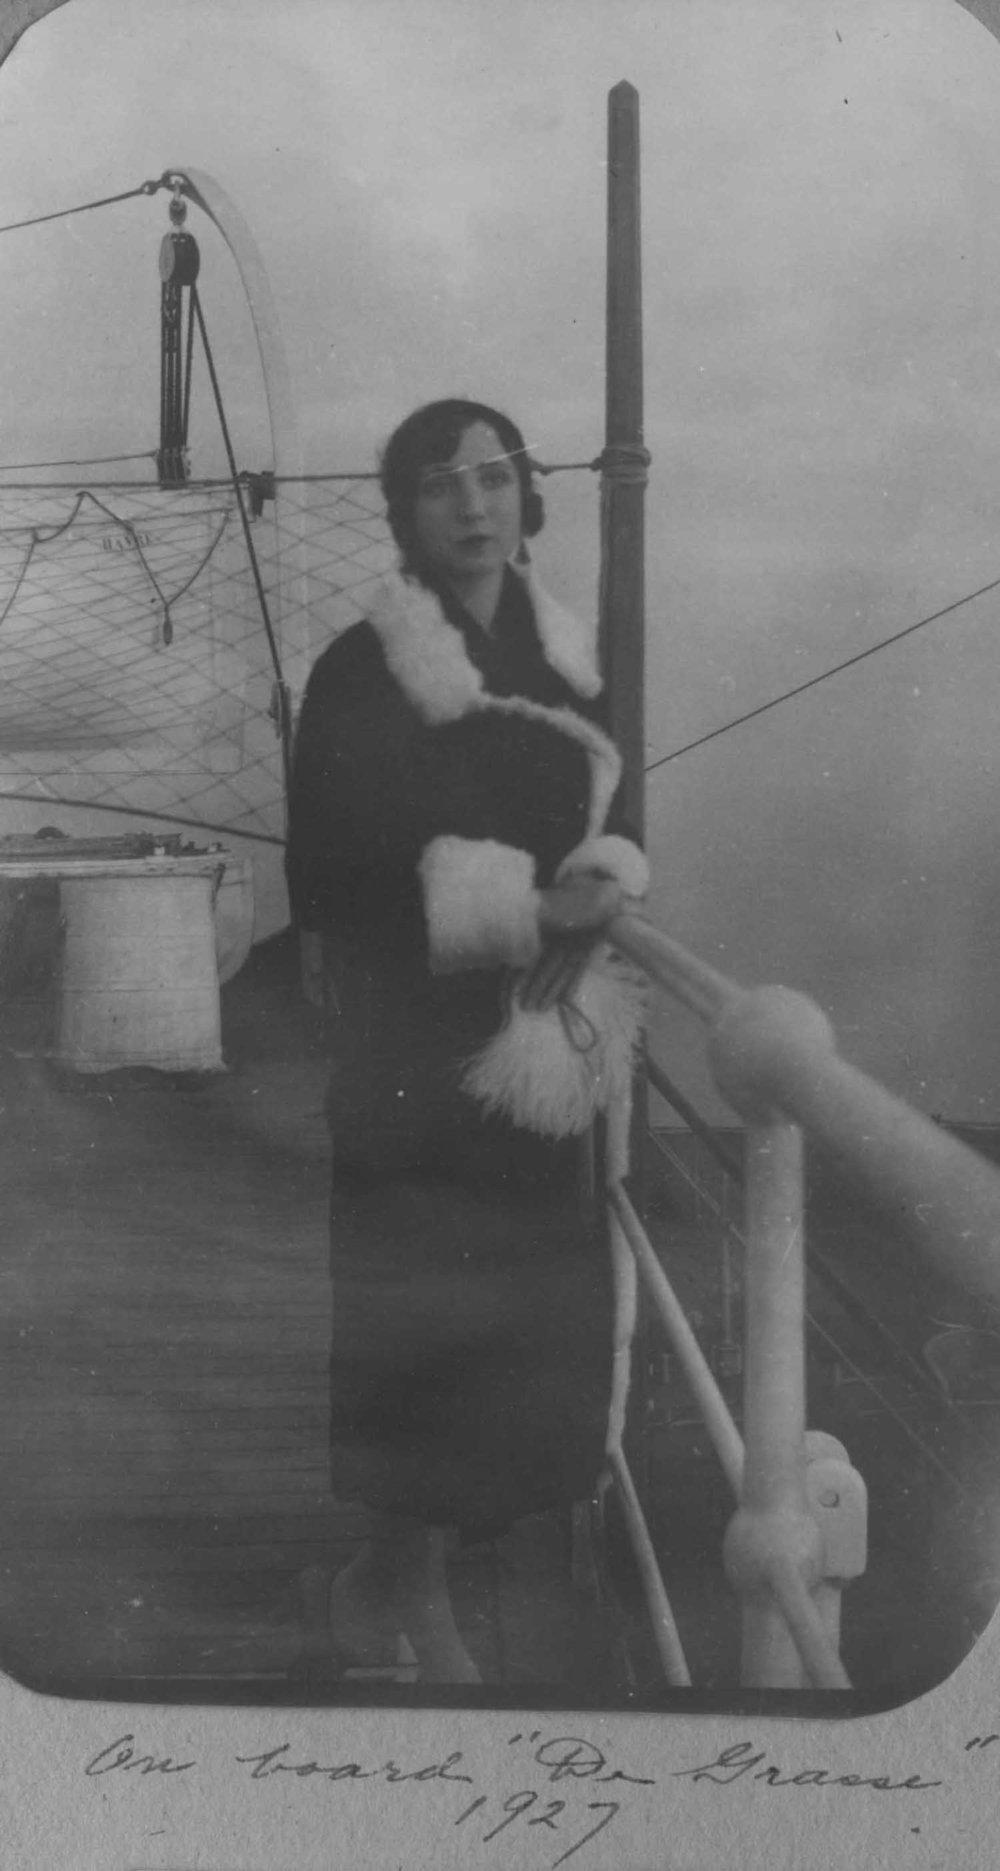 Anais 1927 15 Jul De Grasse.jpg